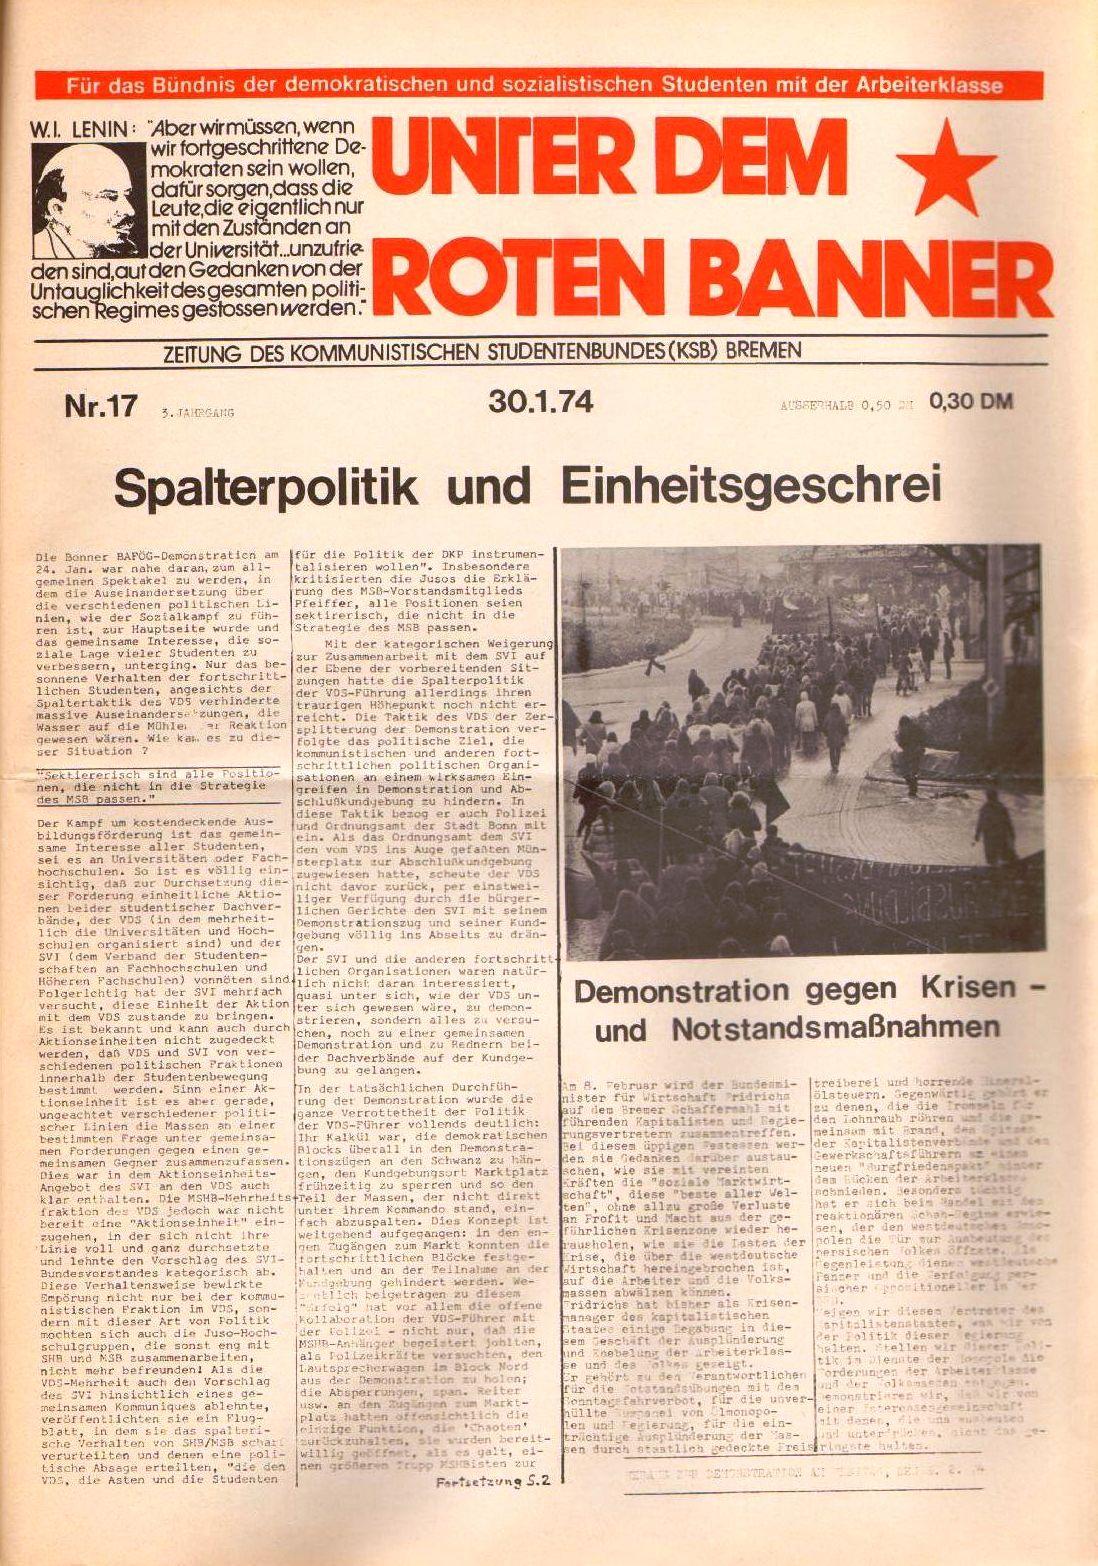 Bremen_Unter_dem_Roten_Banner138